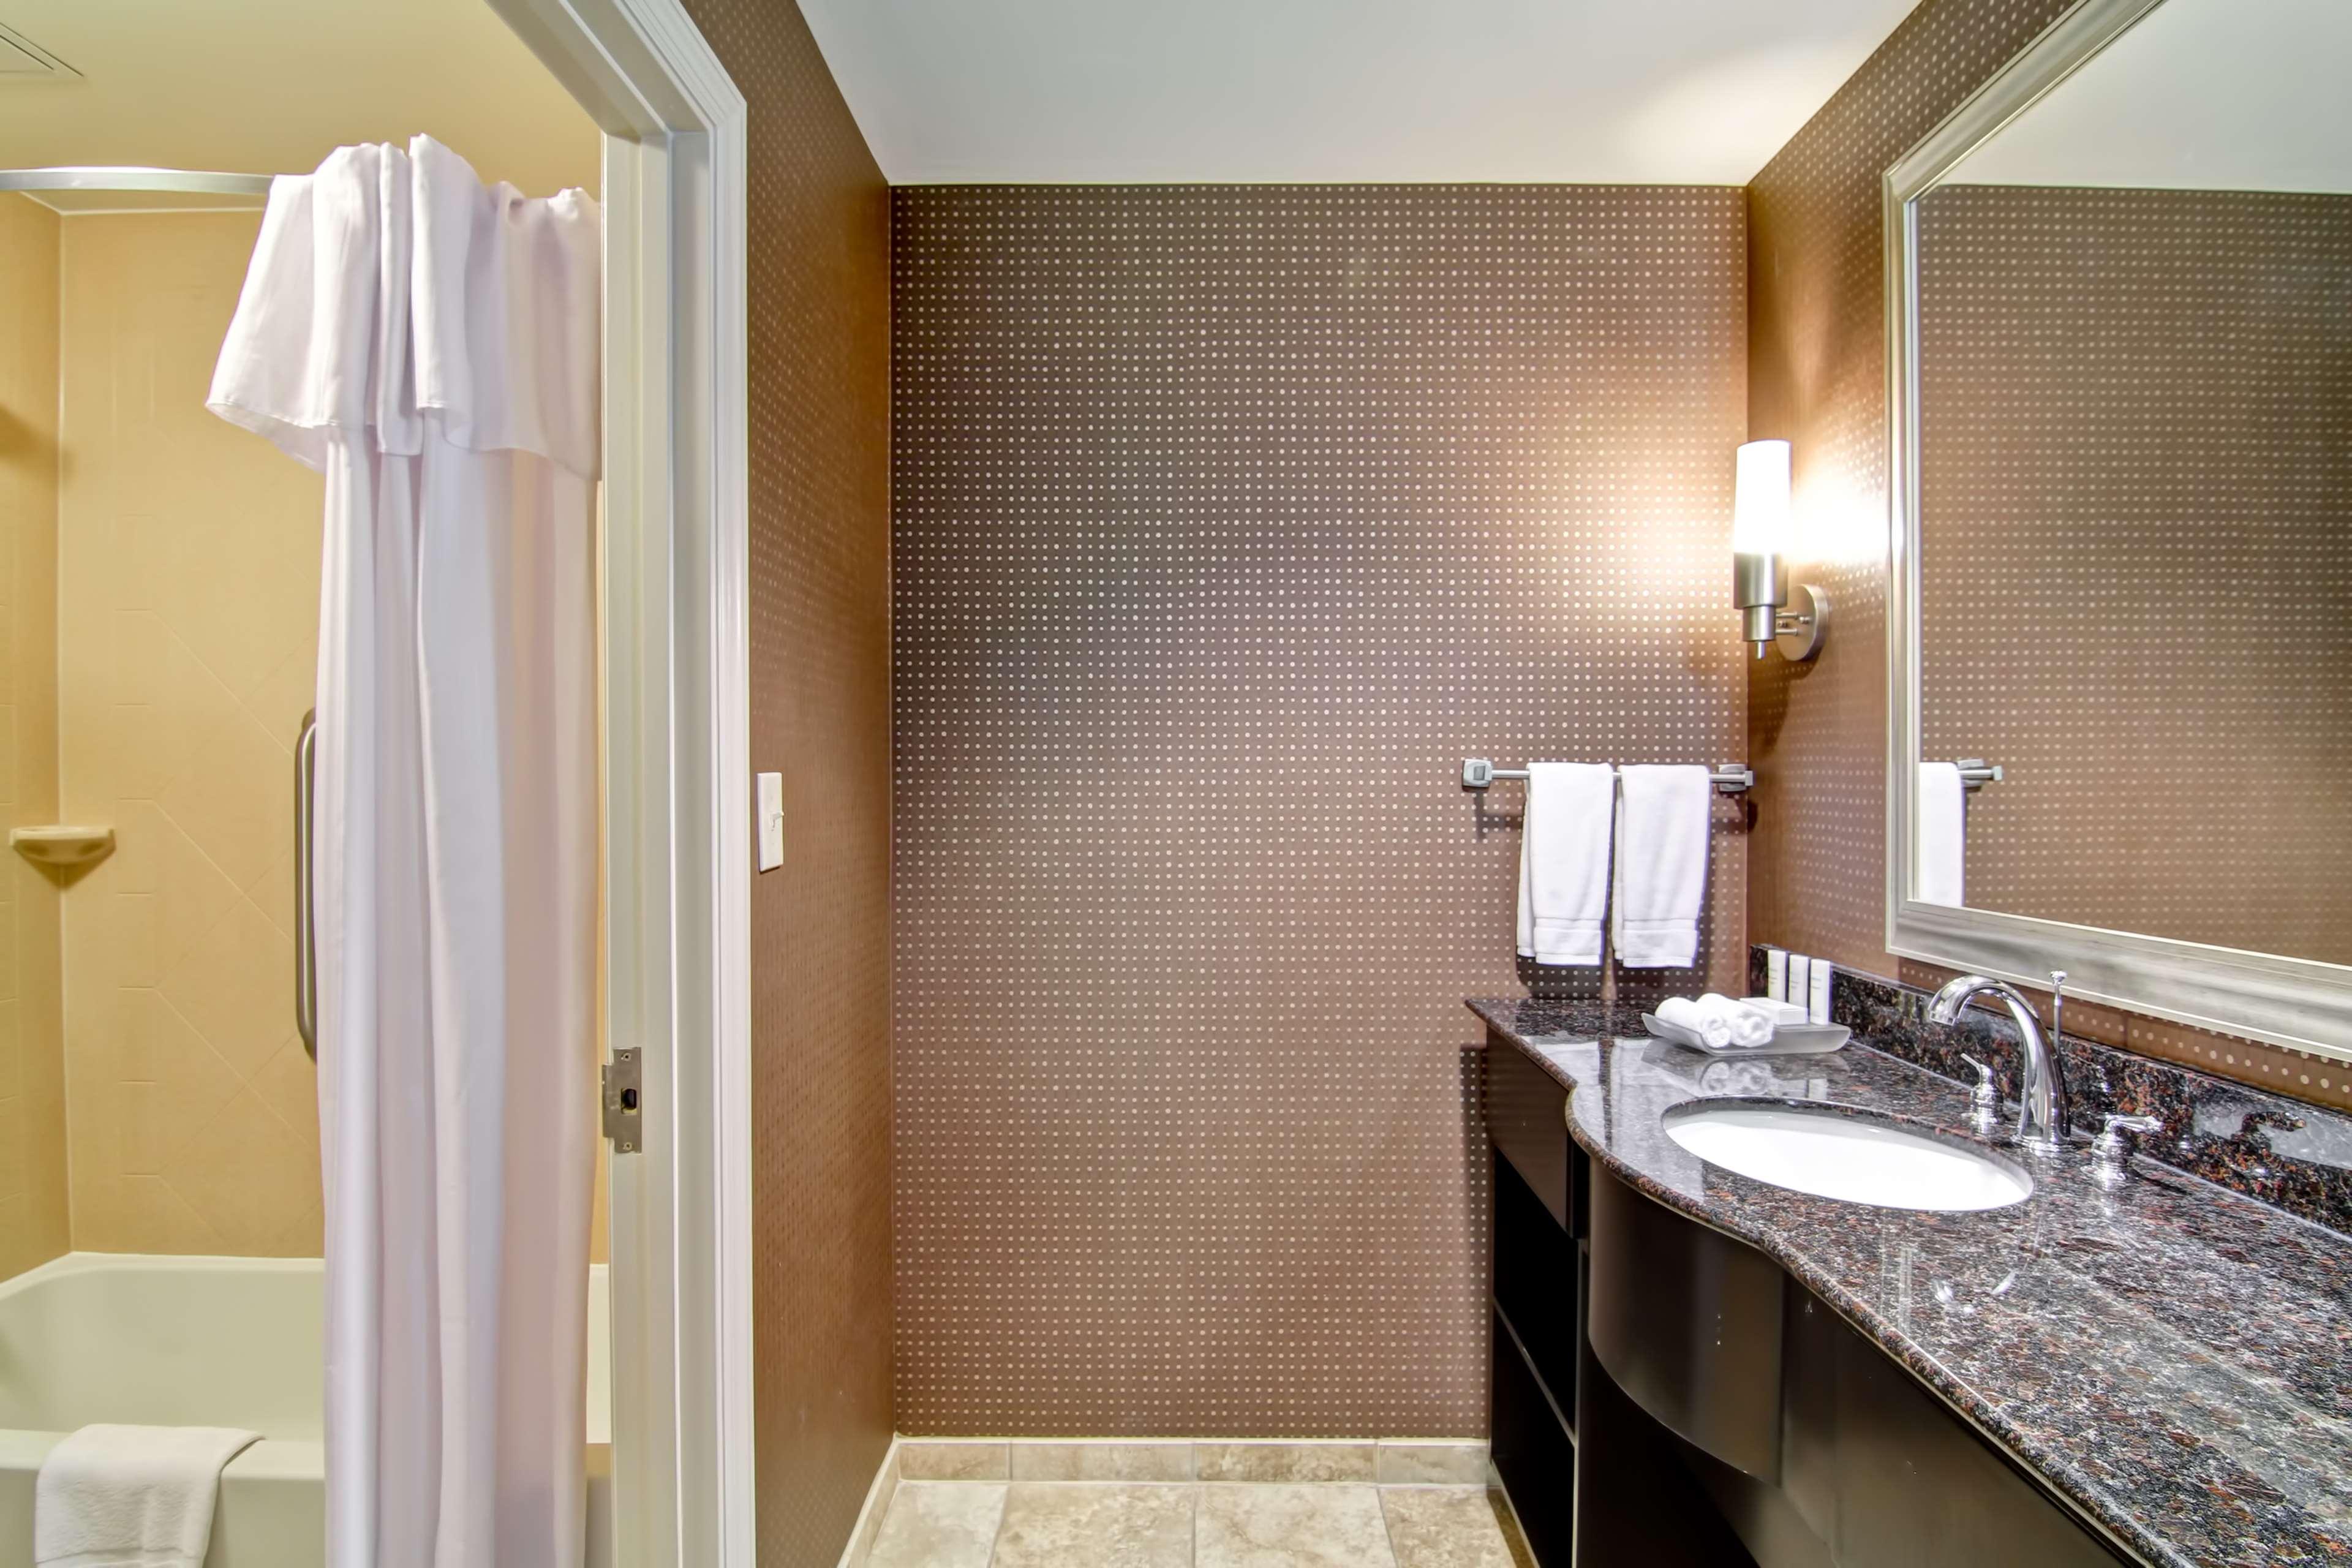 Homewood Suites by Hilton Cincinnati Airport South-Florence image 23